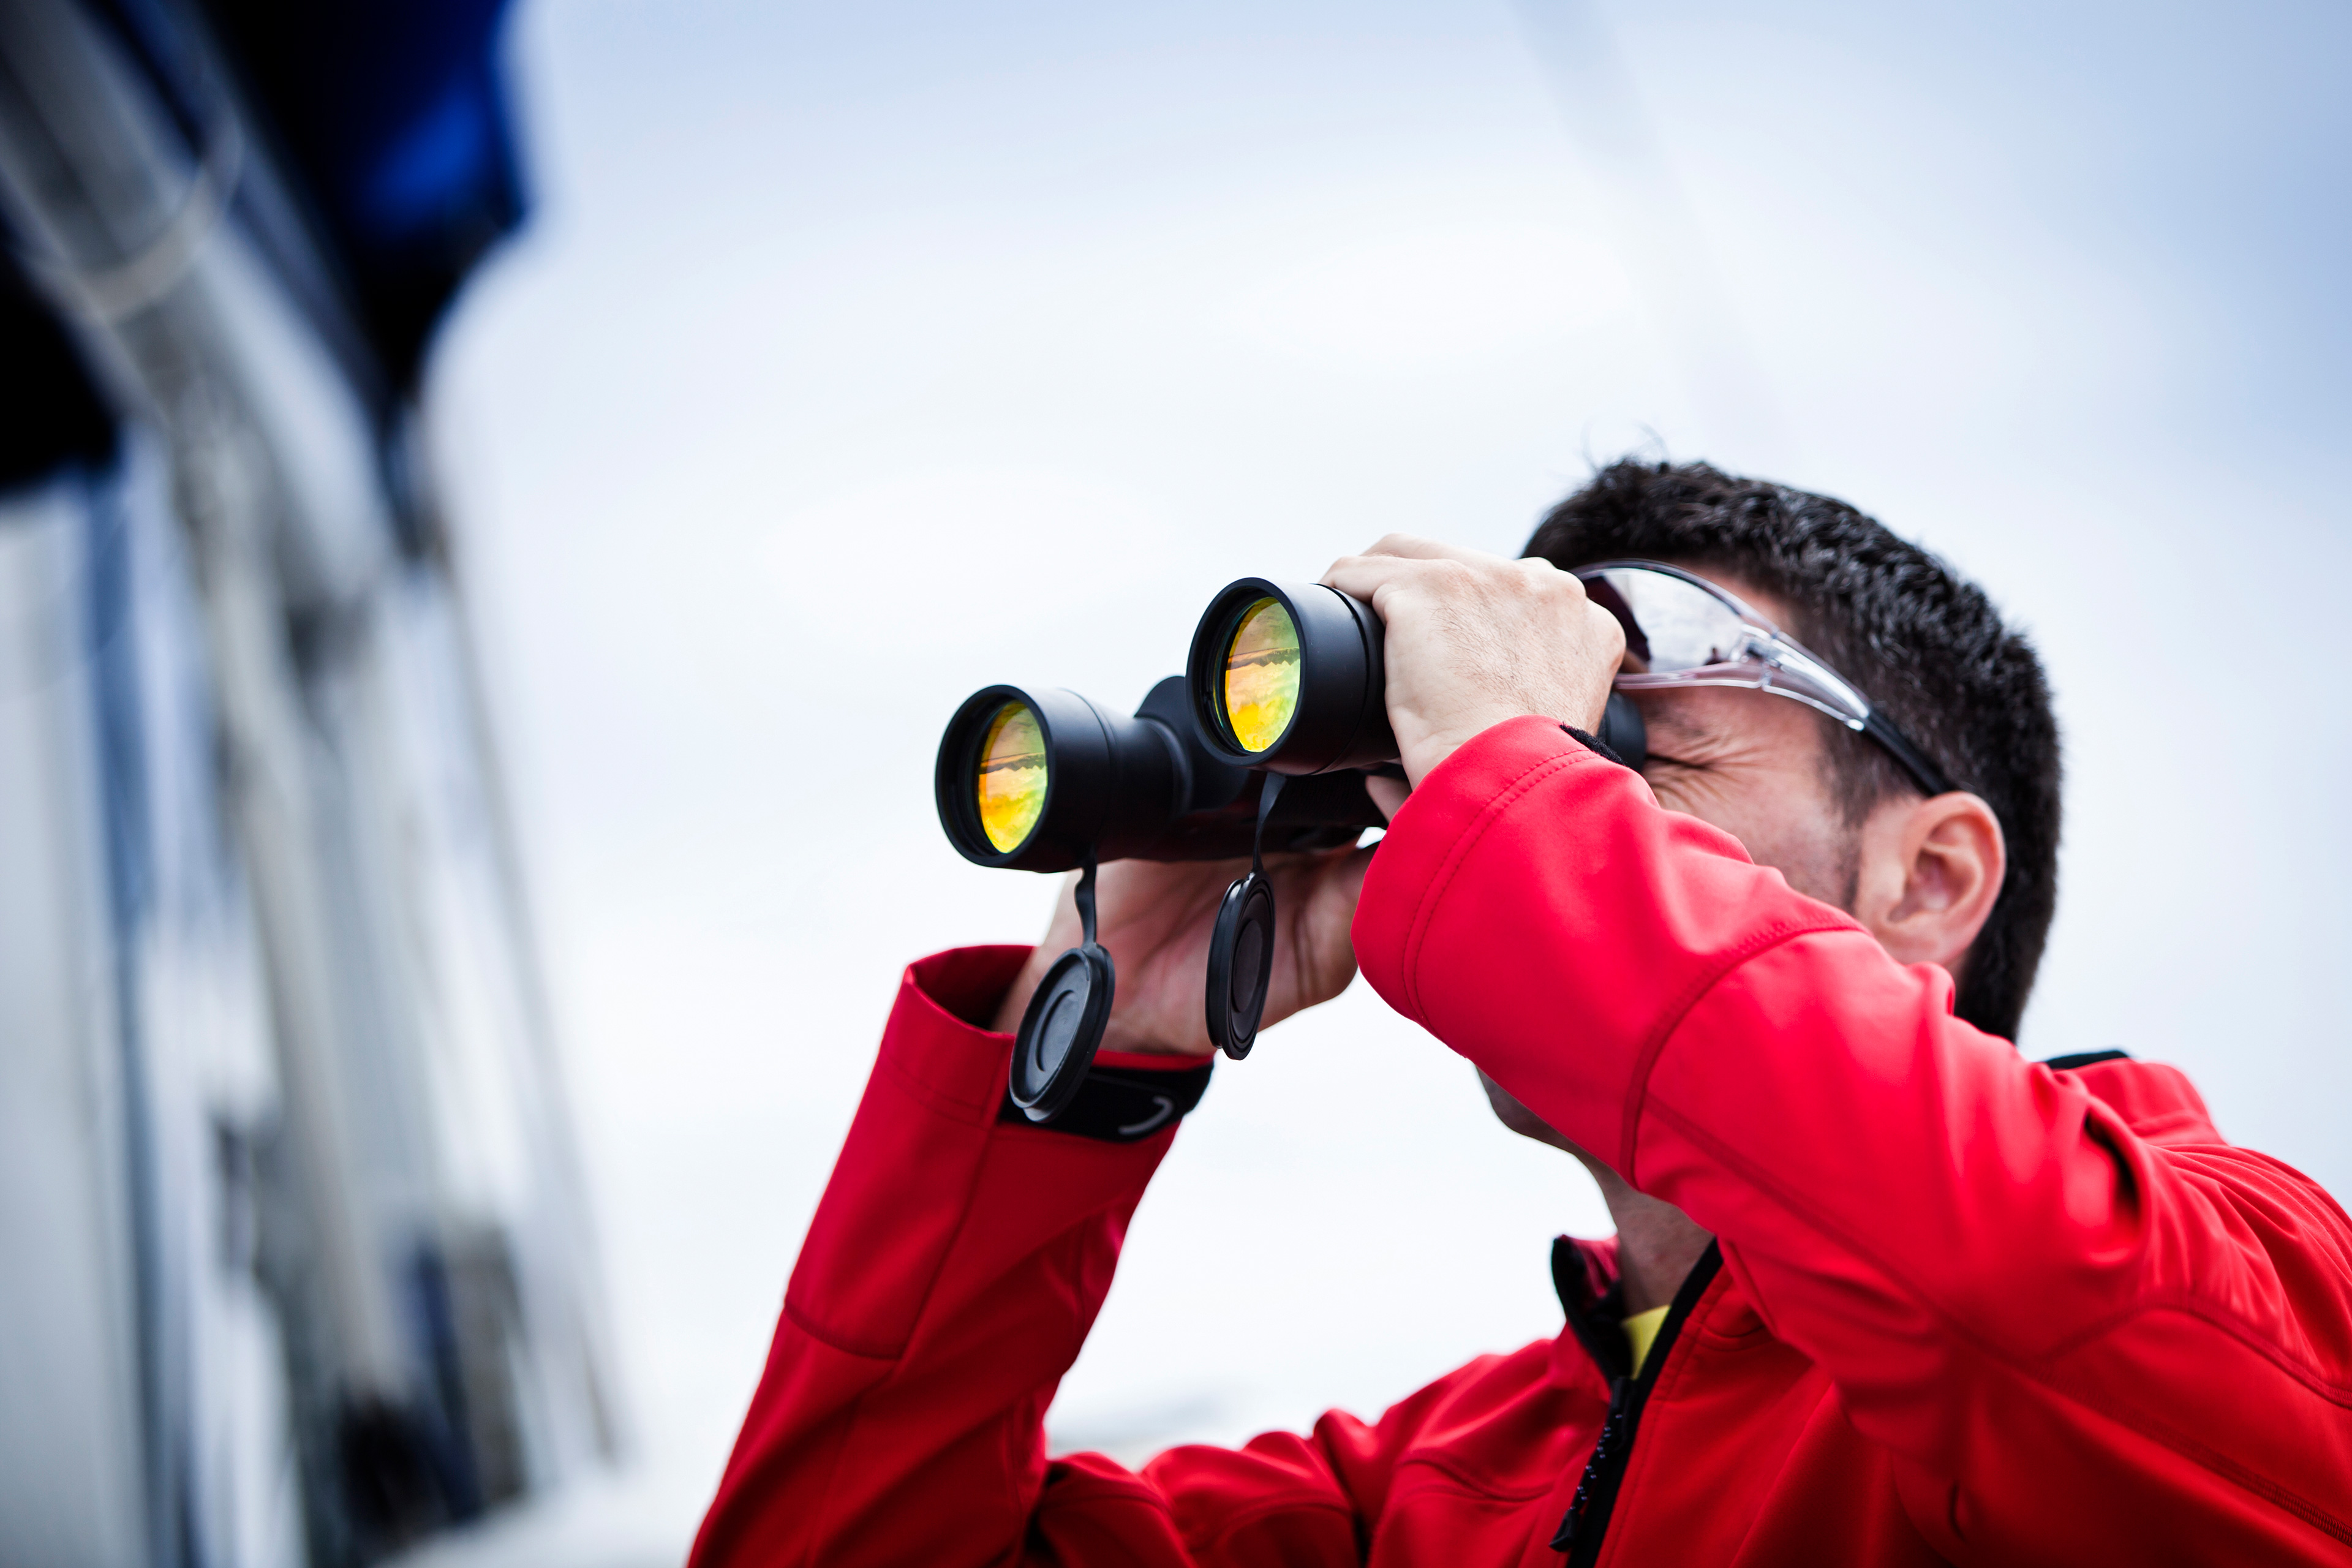 A man looking through binoculars